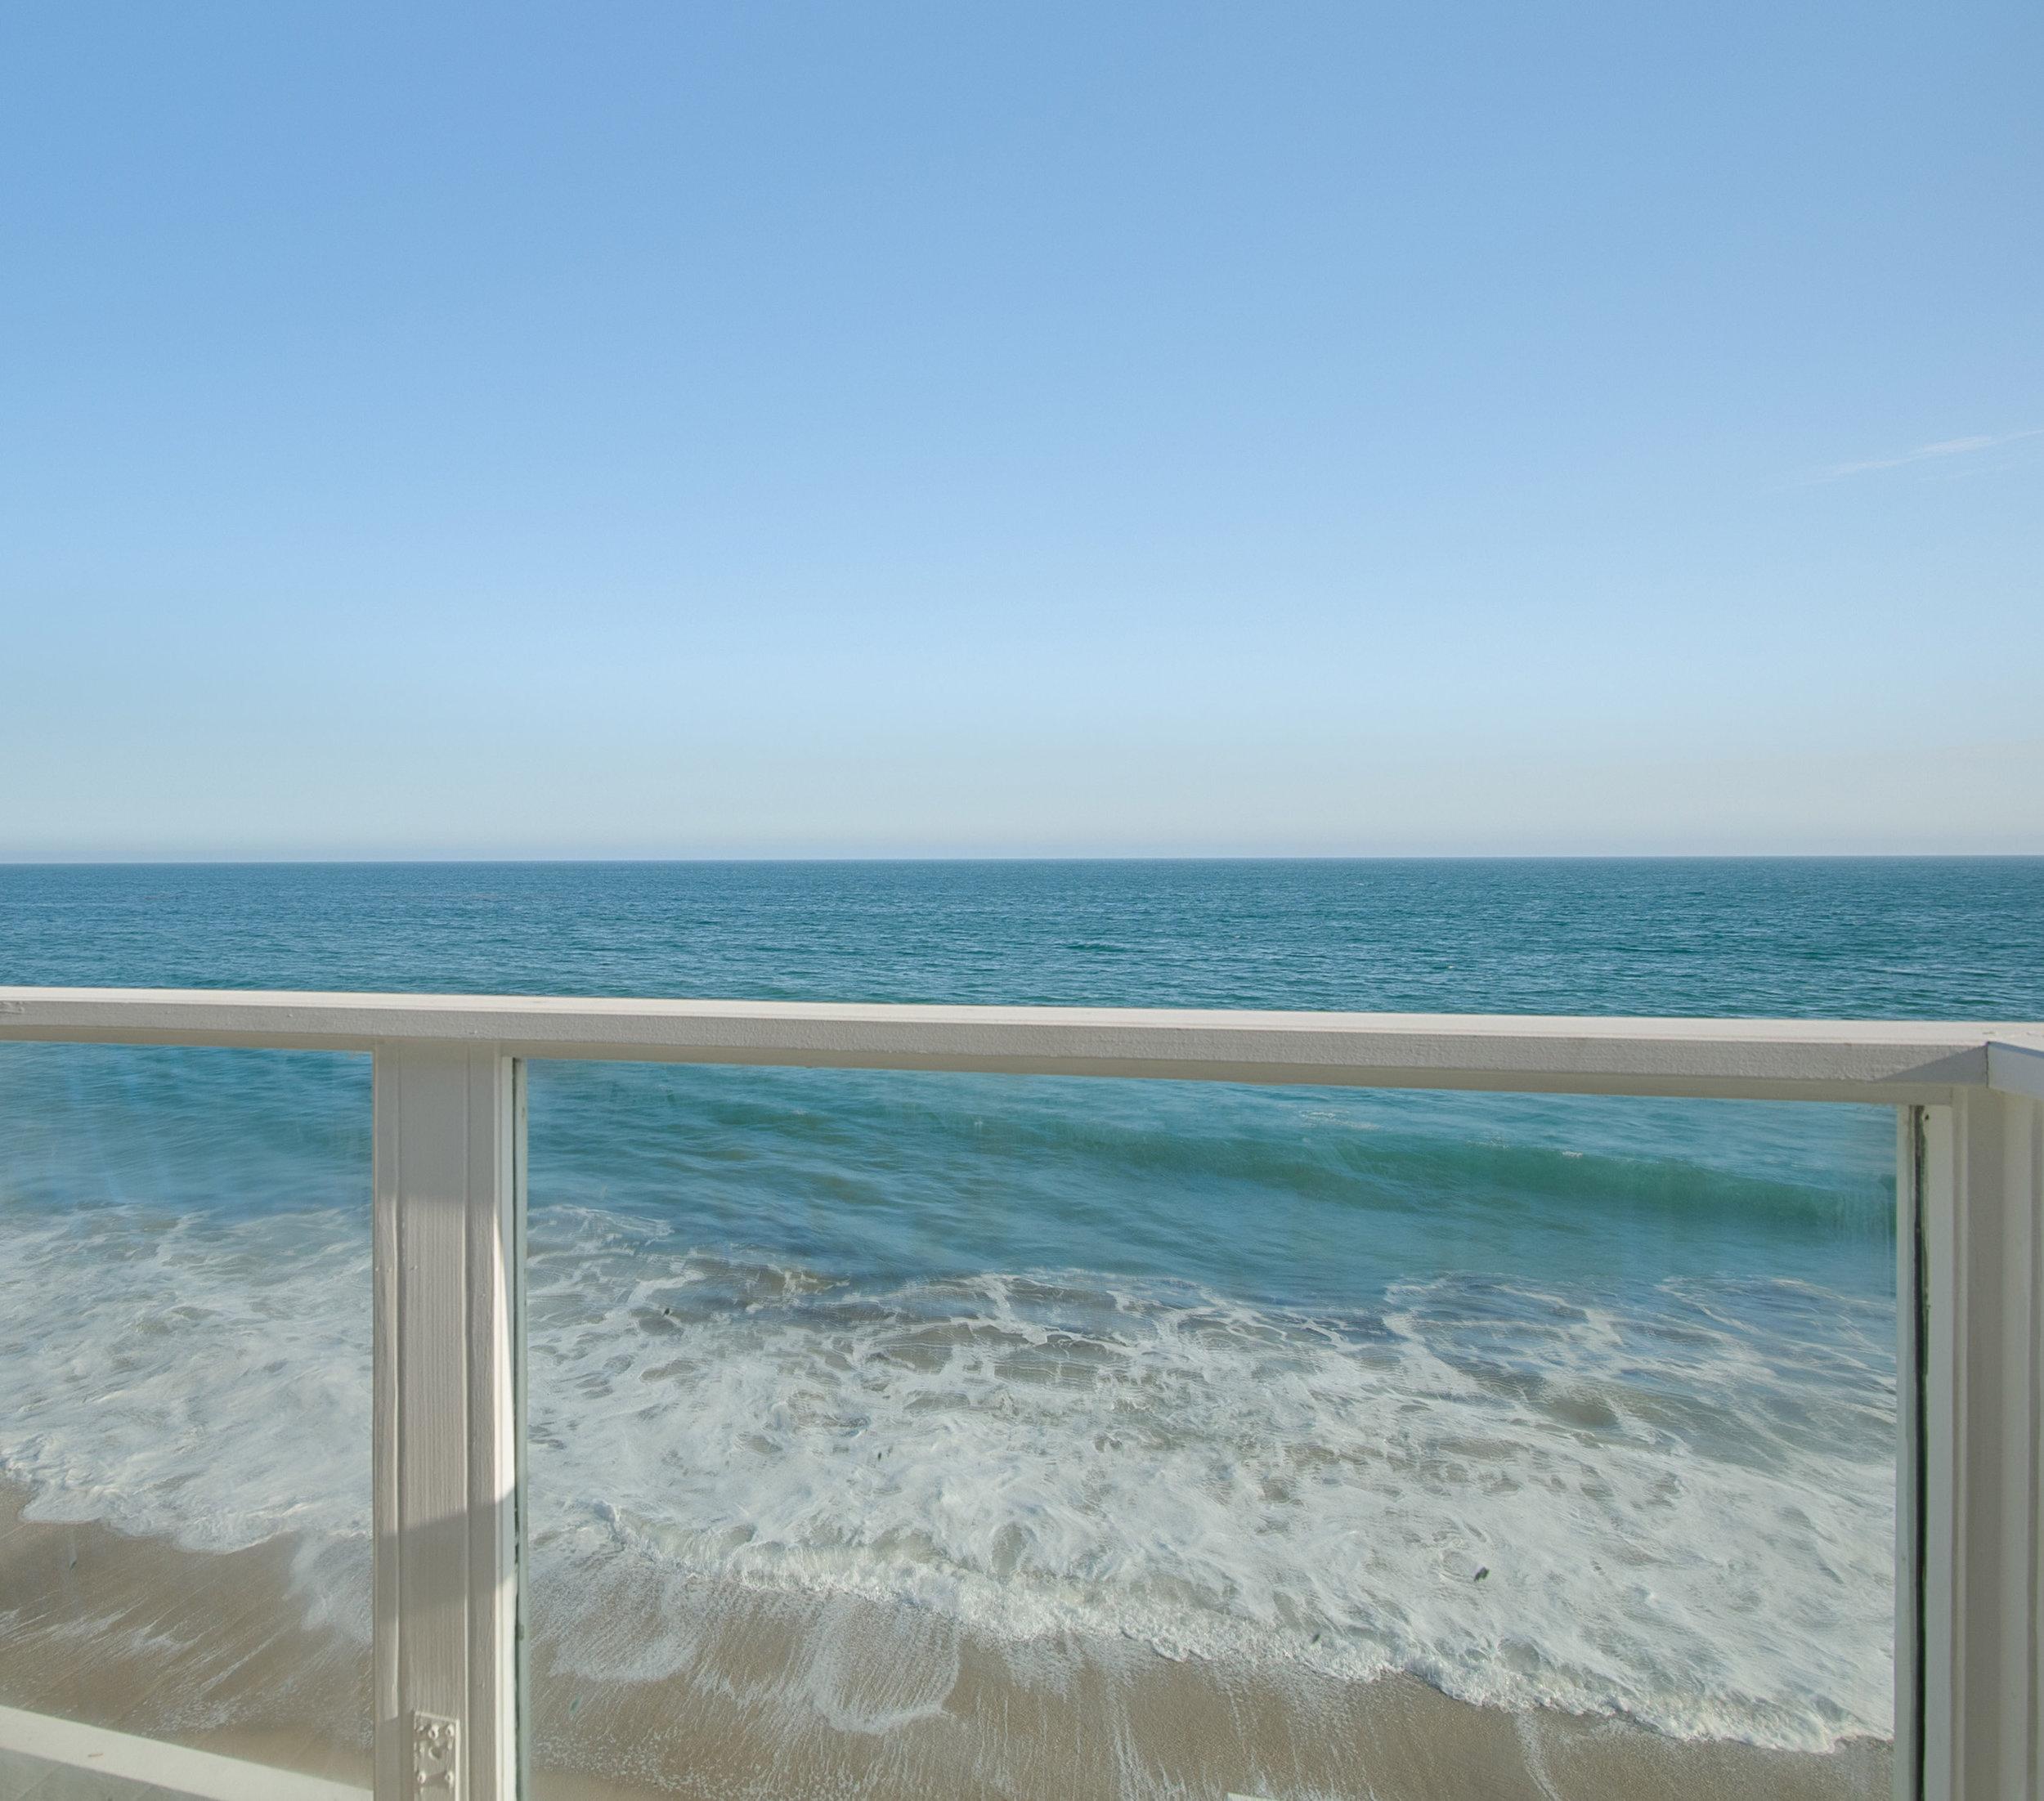 019 Deck 25342 Malibu Road For Sale Lease The Malibu Life Team Luxury Real Estate.jpg